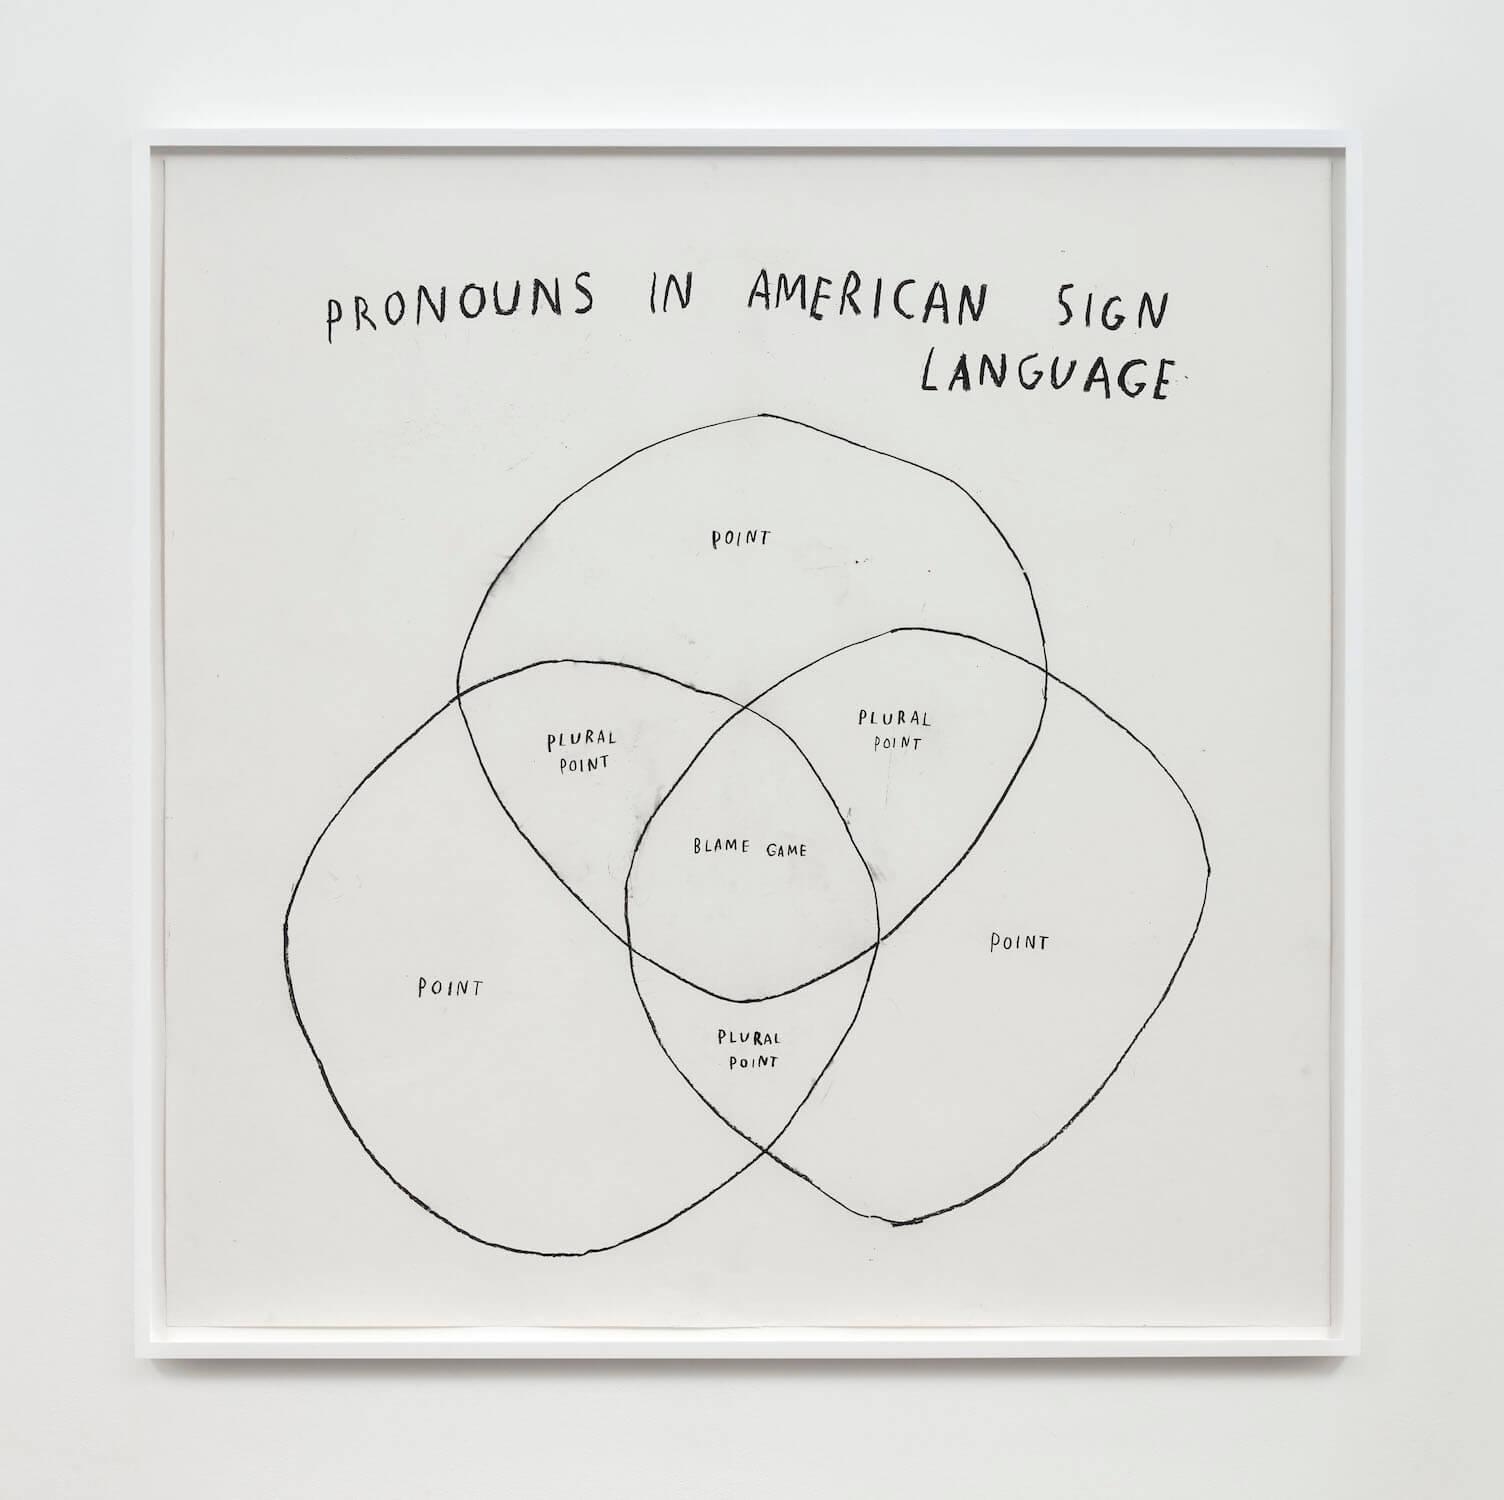 Kim, Pronouns in American Sign Language, 2020 (CSK 20.031) A